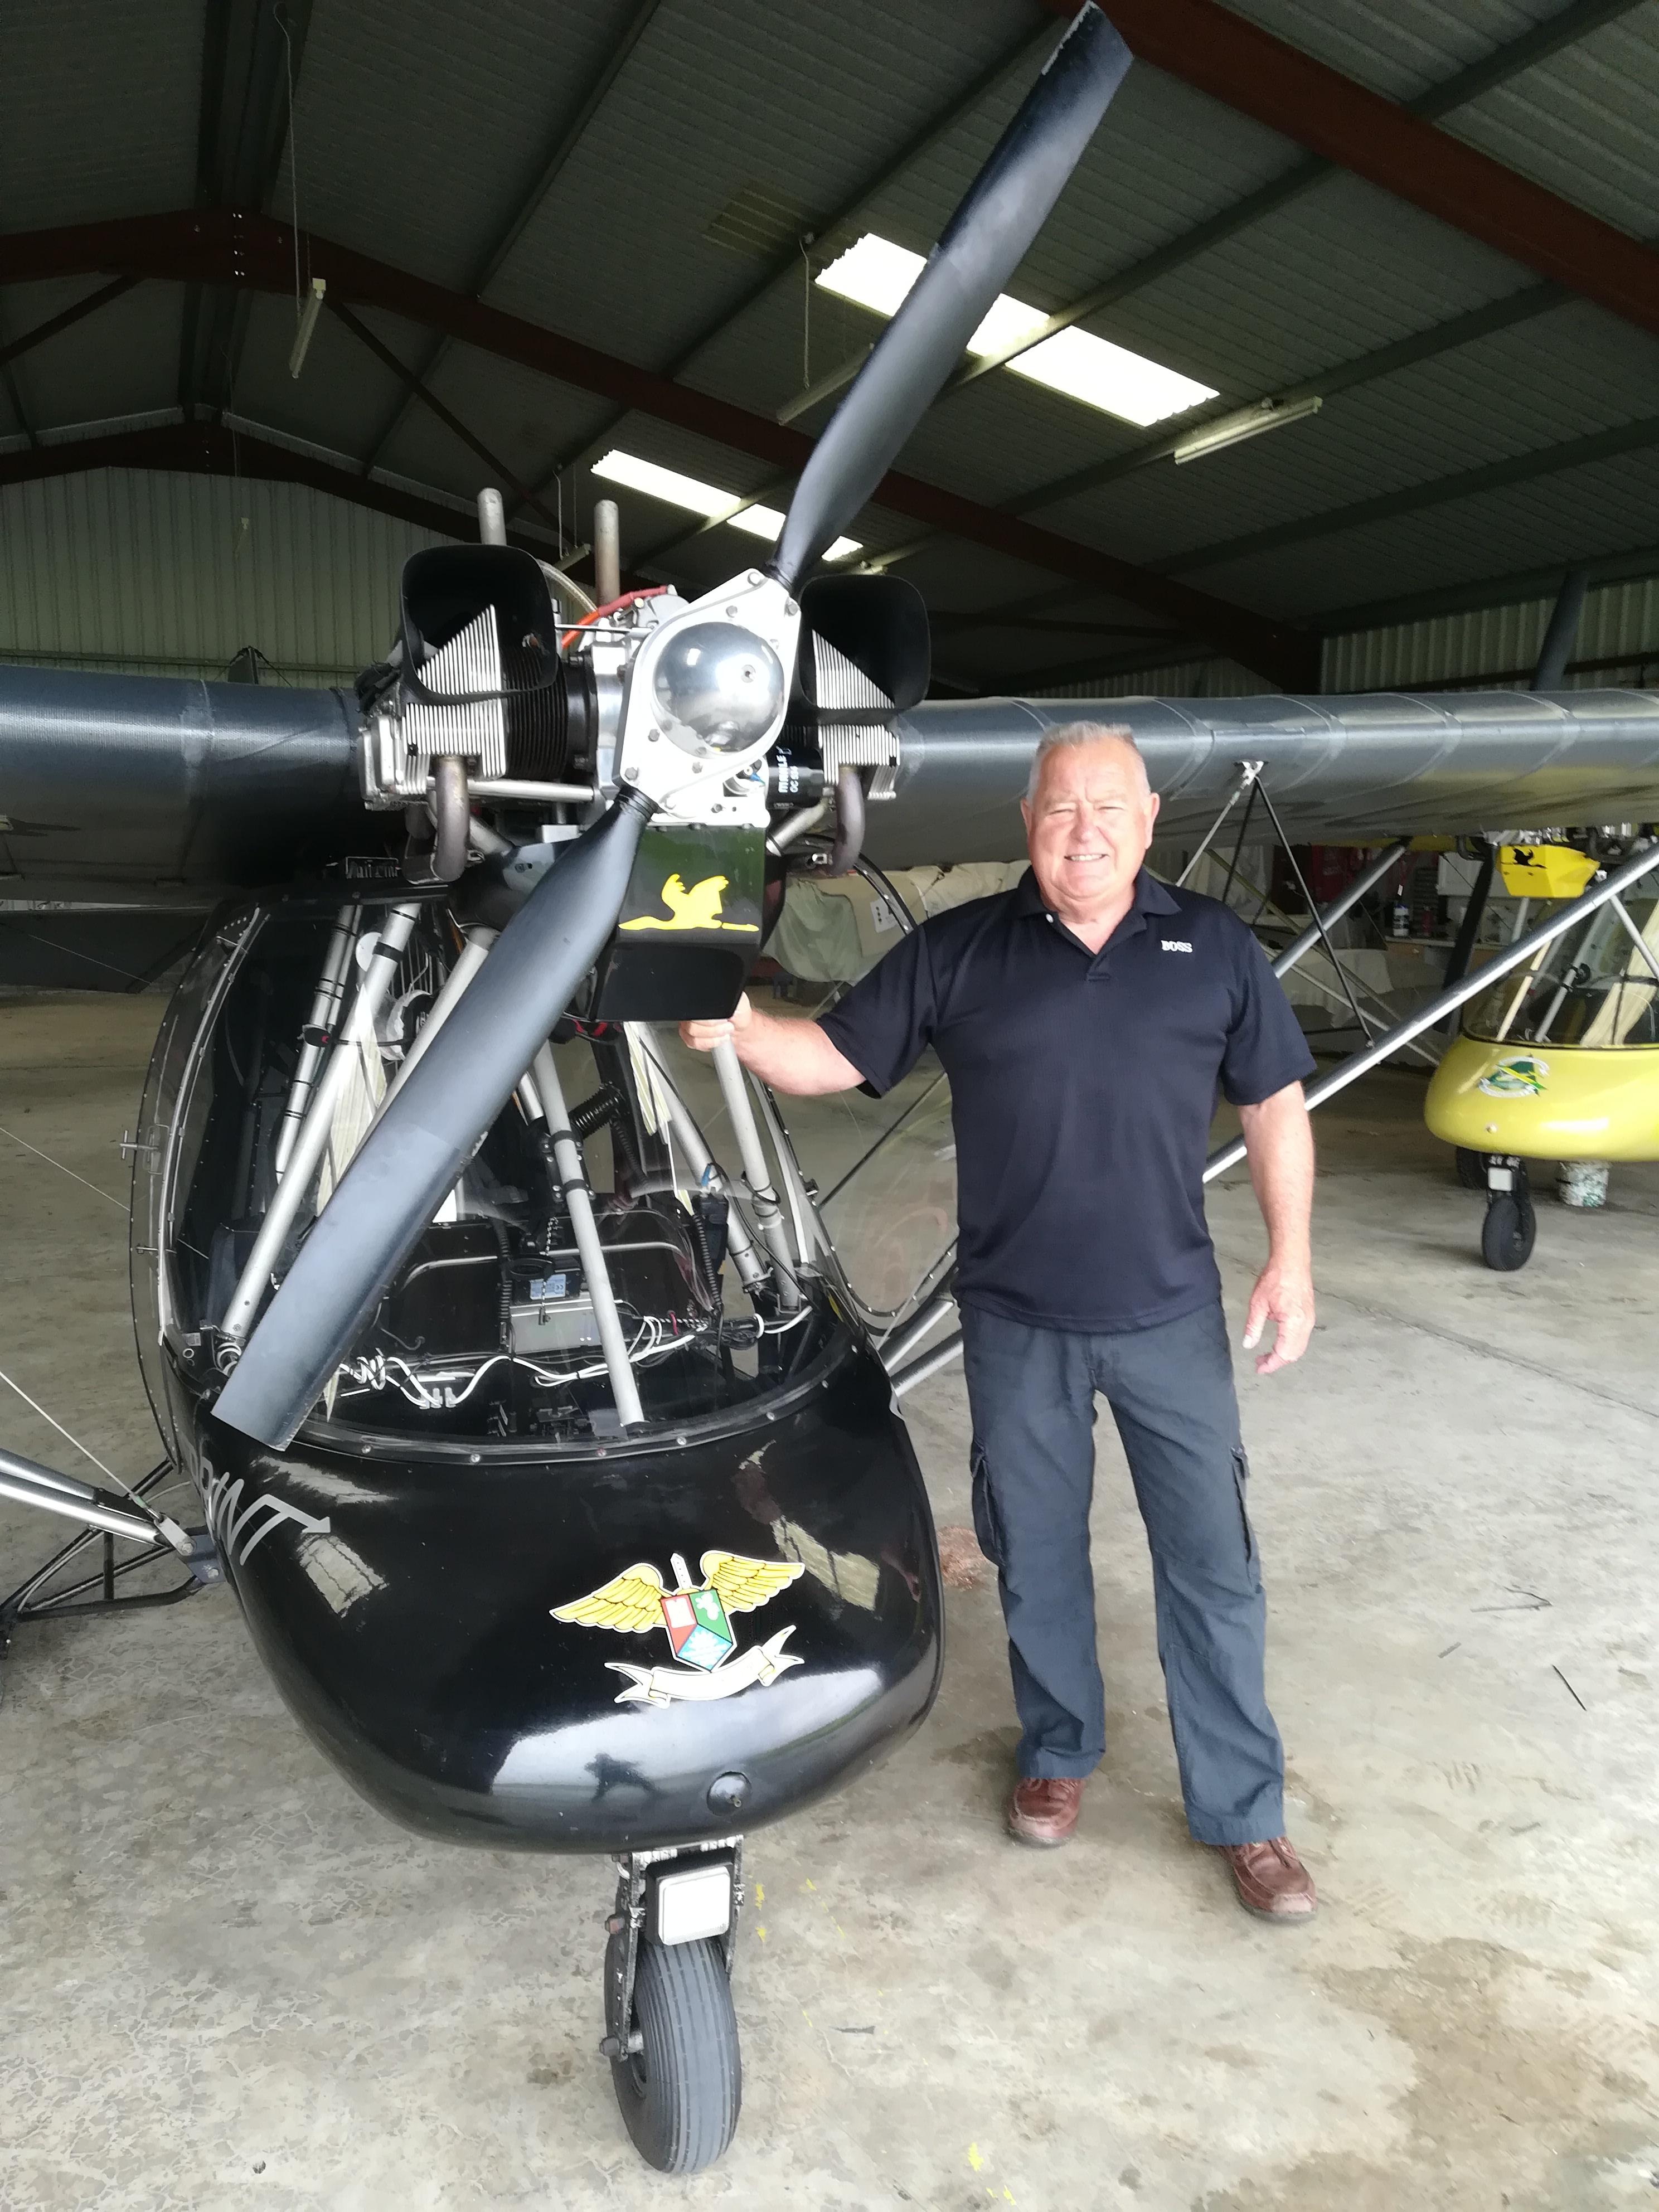 Doug King adds UK Microlight License to his collection